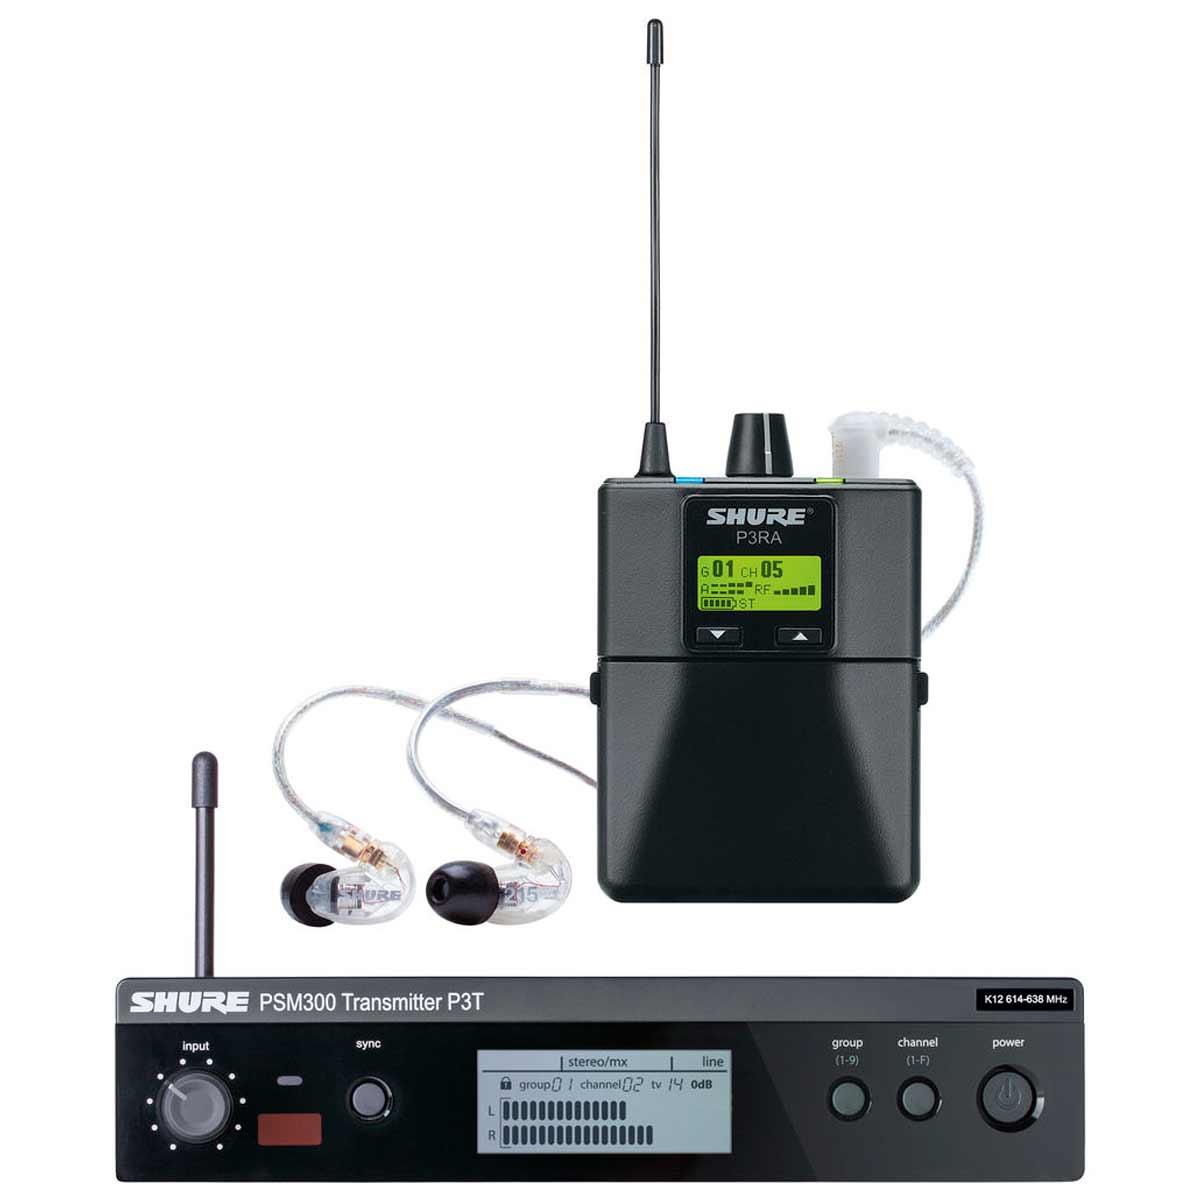 PSM300SE215 - Ponto Eletr�nico s/ Fio c/ Fone In-ear PSM 300 SE215 - Shure